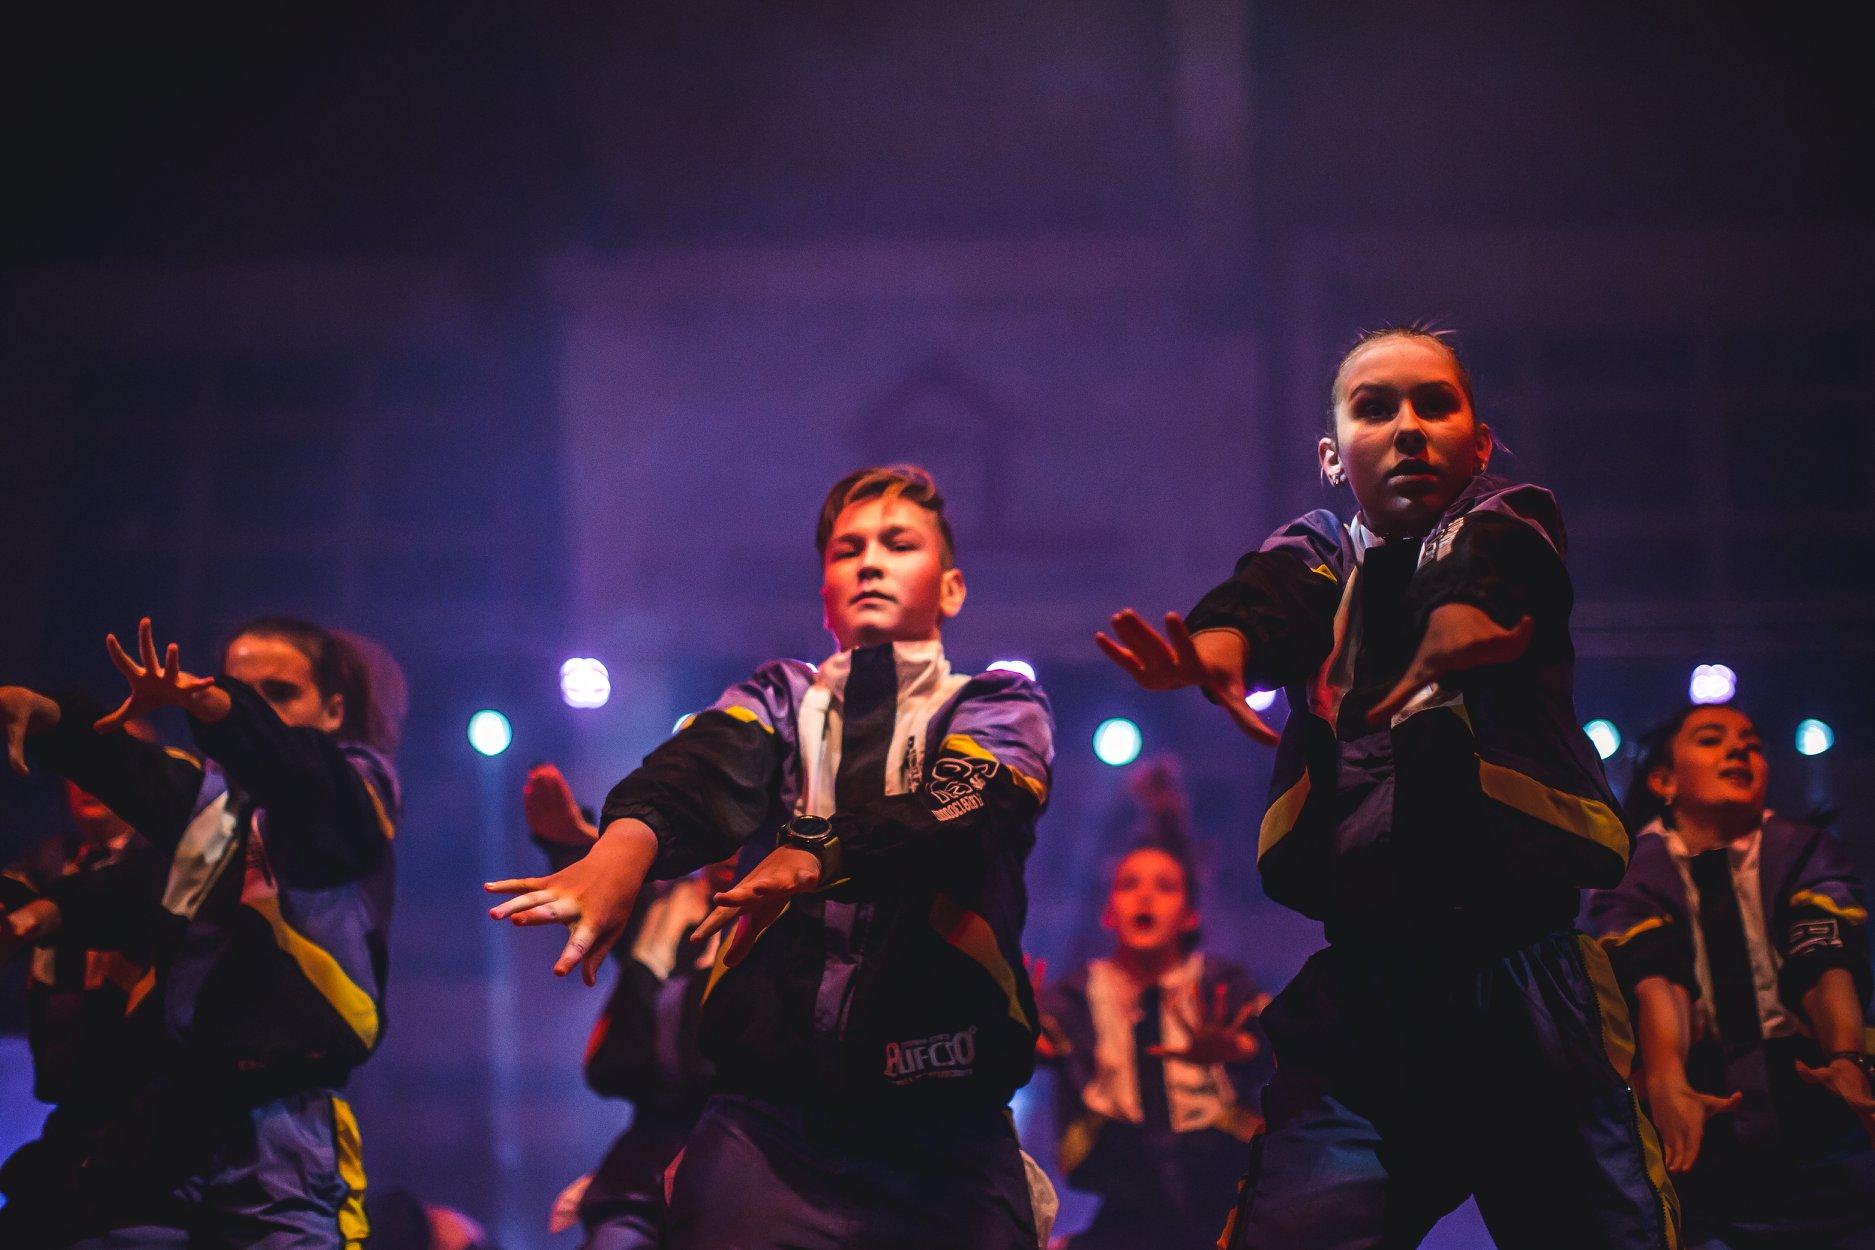 Plesni tečaji 3